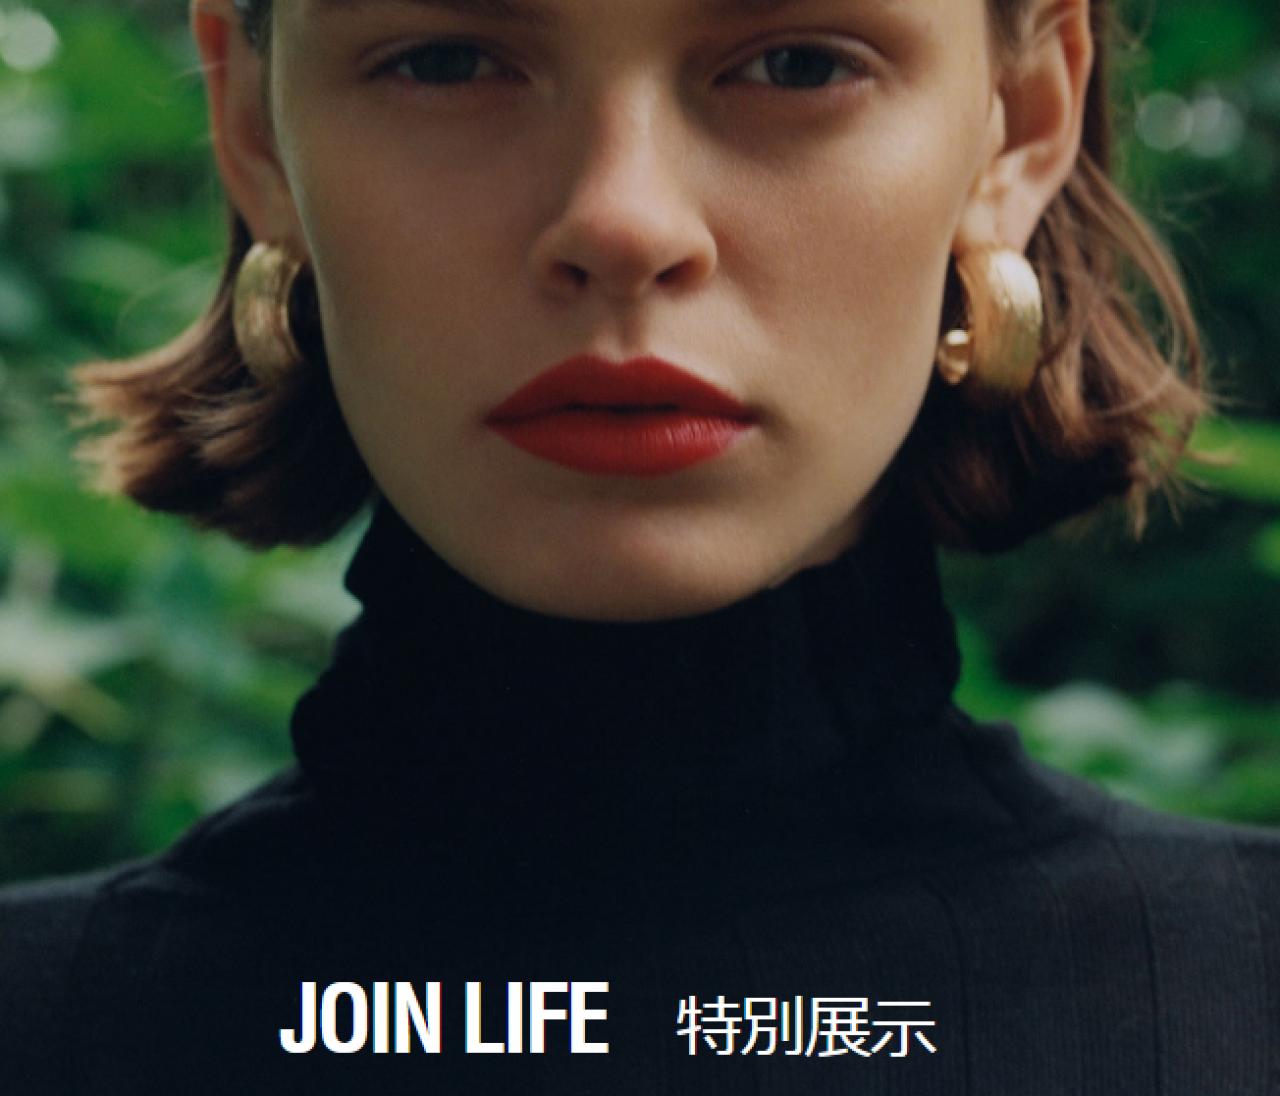 【ZARA JOIN LIFE】新作18選Photo Gallery